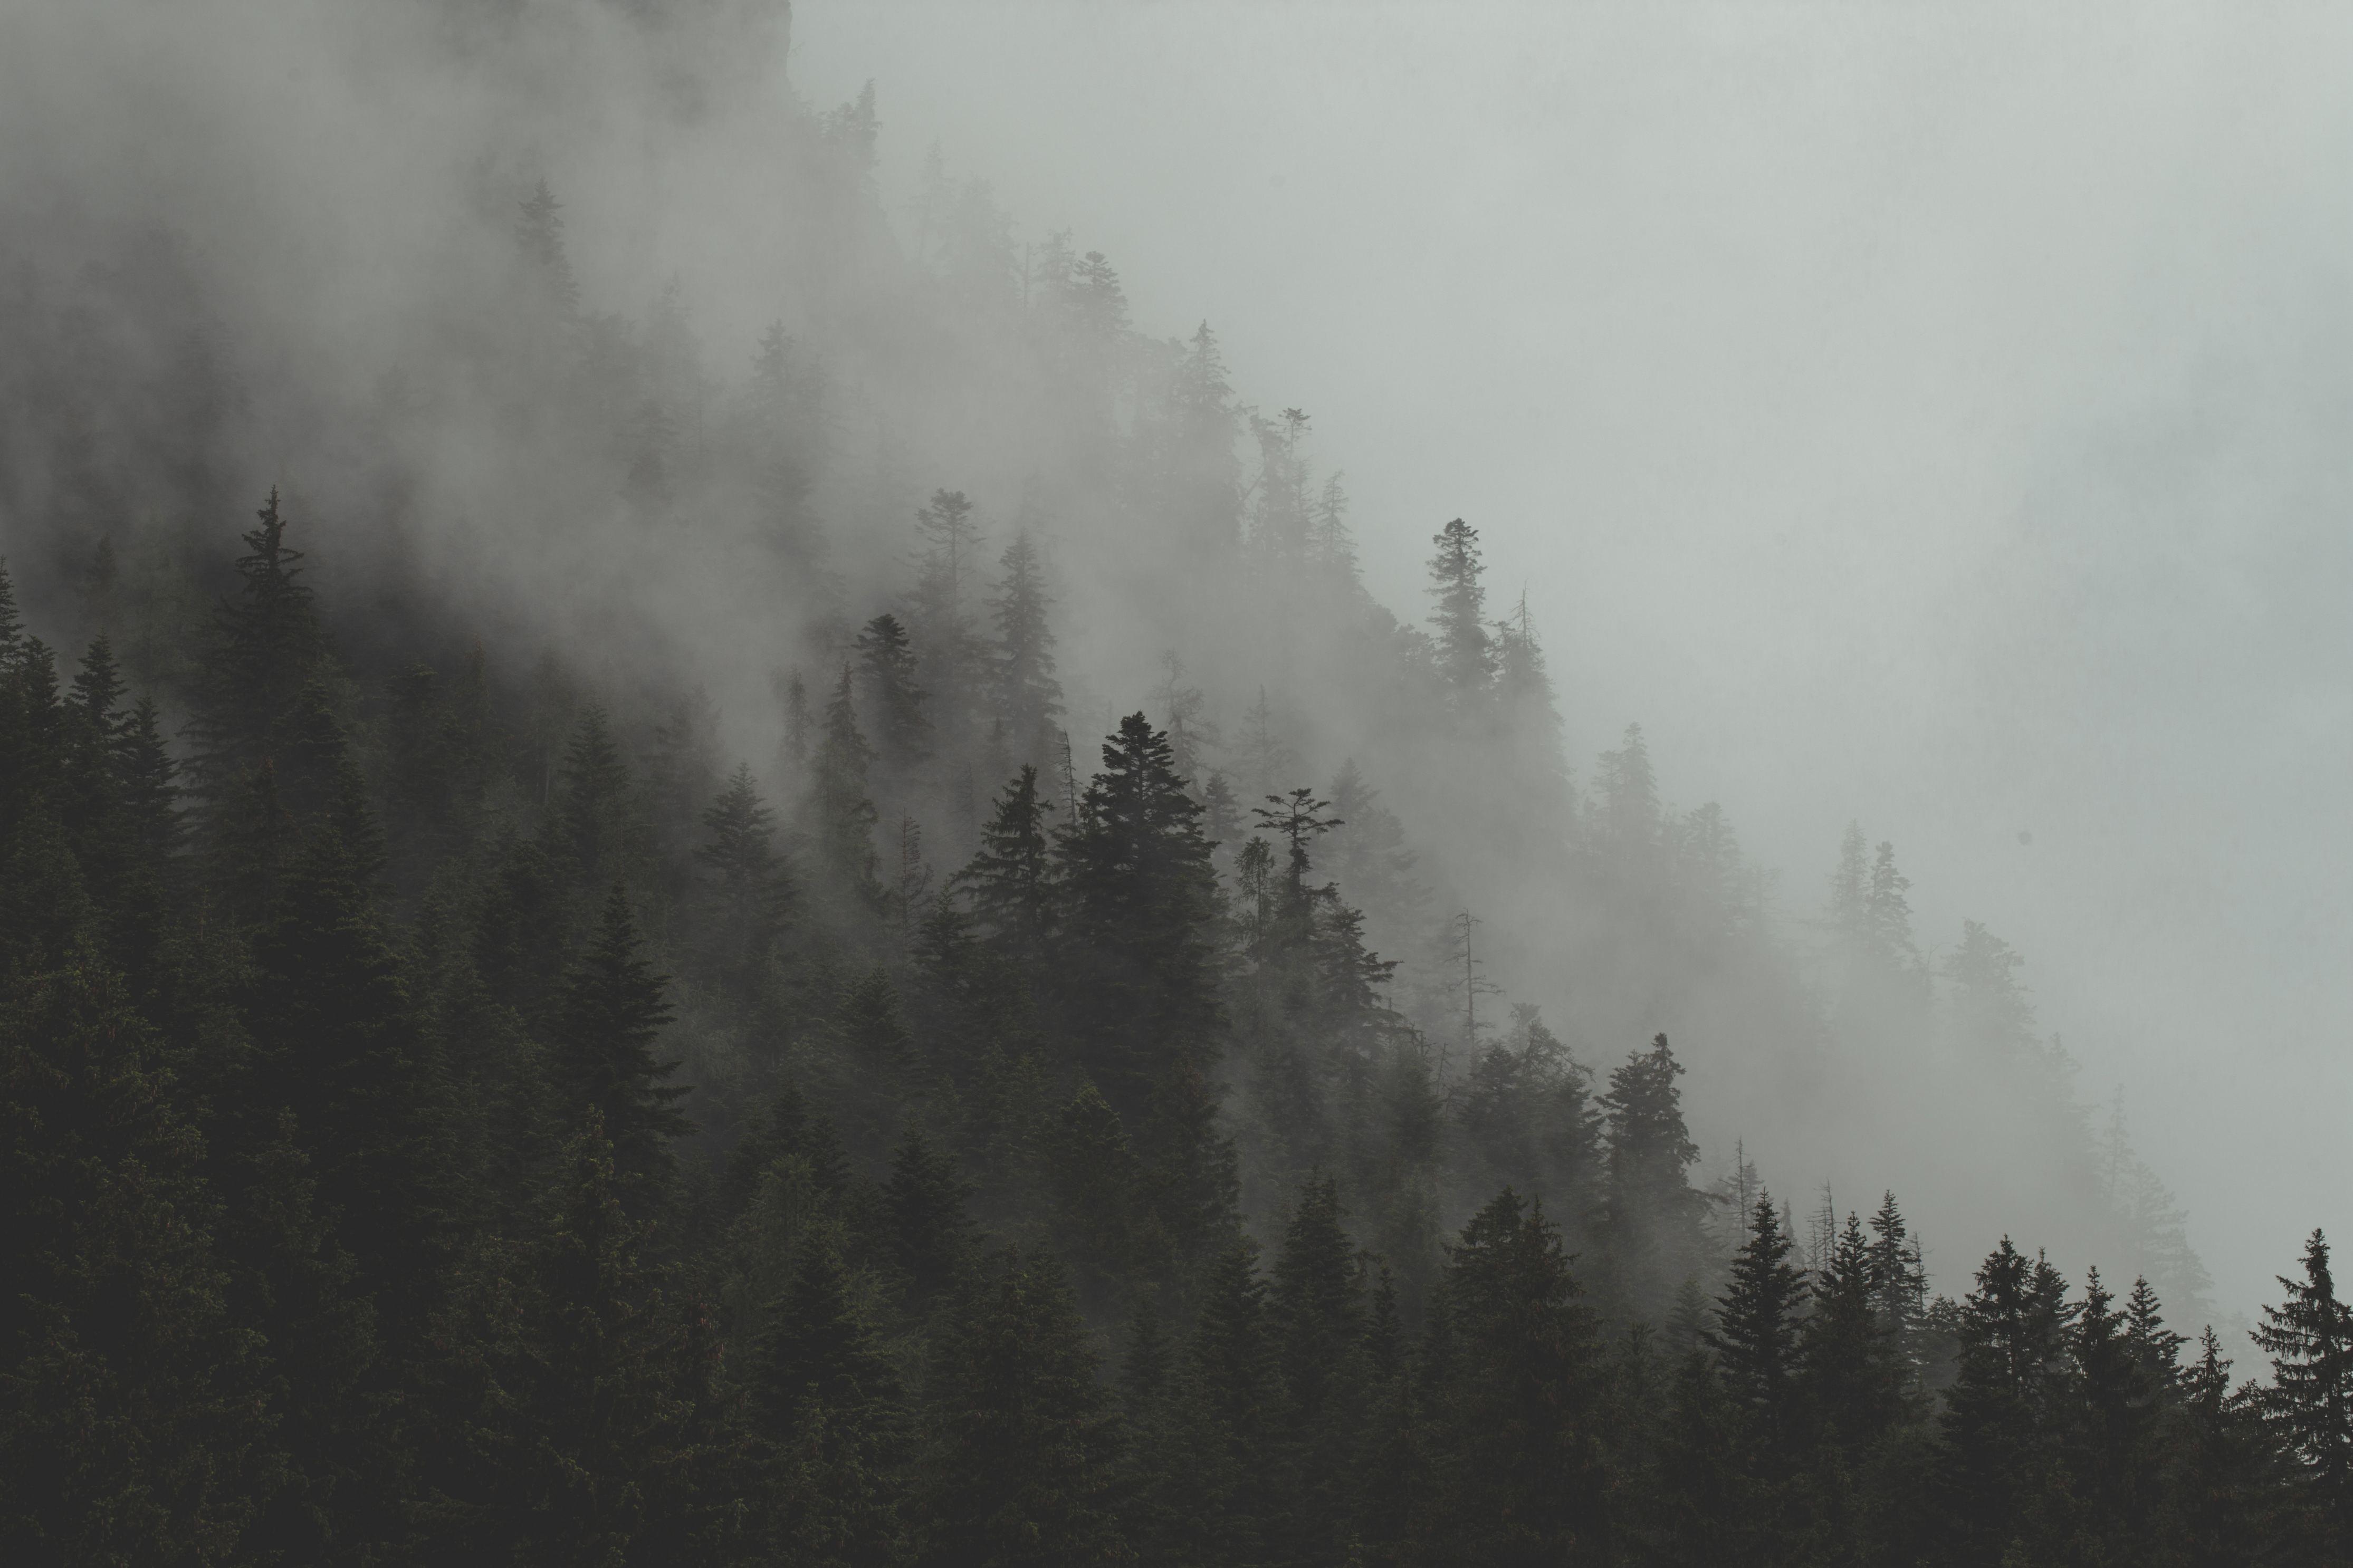 https://magdeleine.co/photo-by-jp-valery-n-1299/ - Fog Rolls Through Forest Hillside